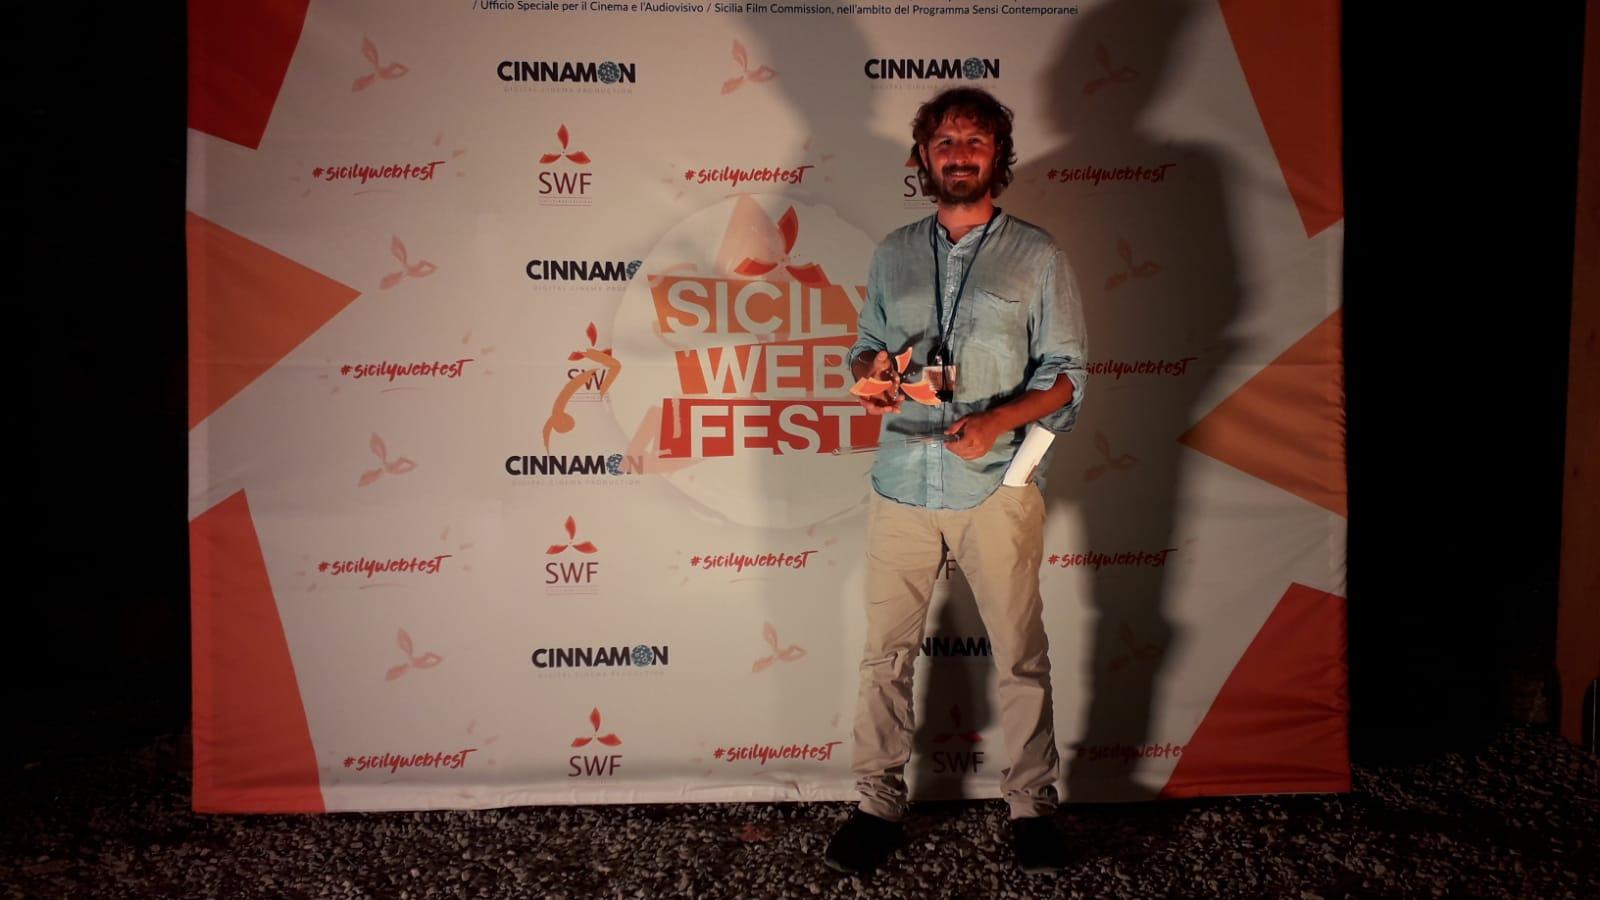 gela-premio-sicily-web-fest